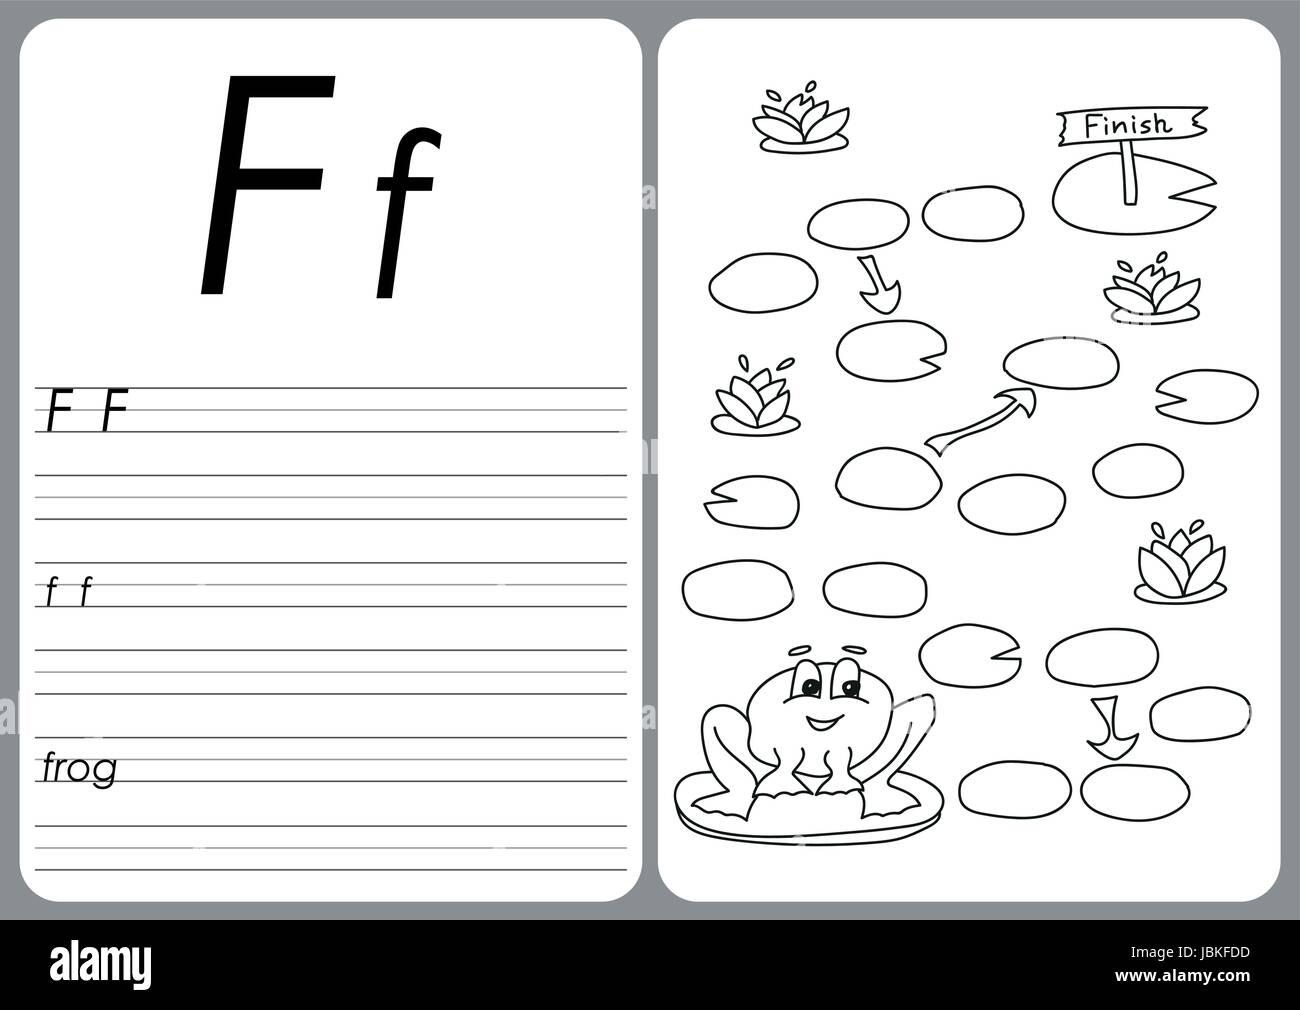 Cartoon-Frosch-Spiel. Vektor Buch Malvorlagen Vektor Abbildung ...